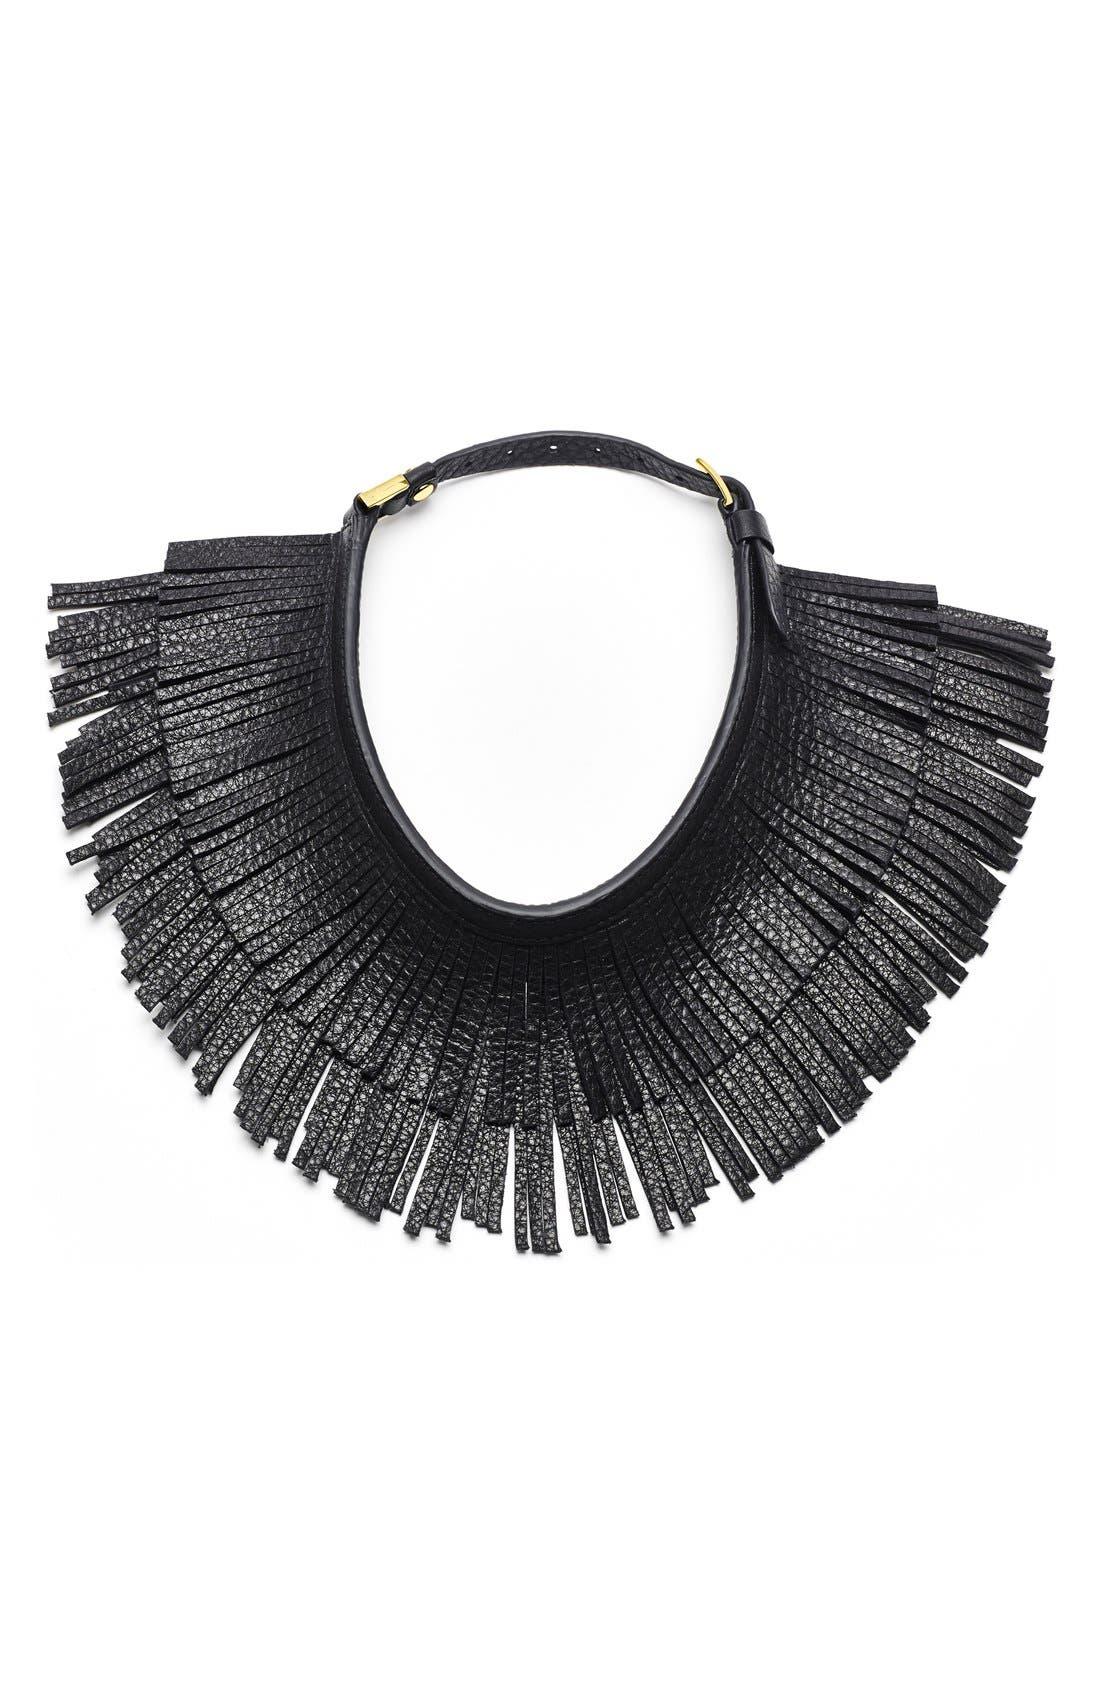 Main Image - Hayden-Harnett Leather Fringe Collar Necklace